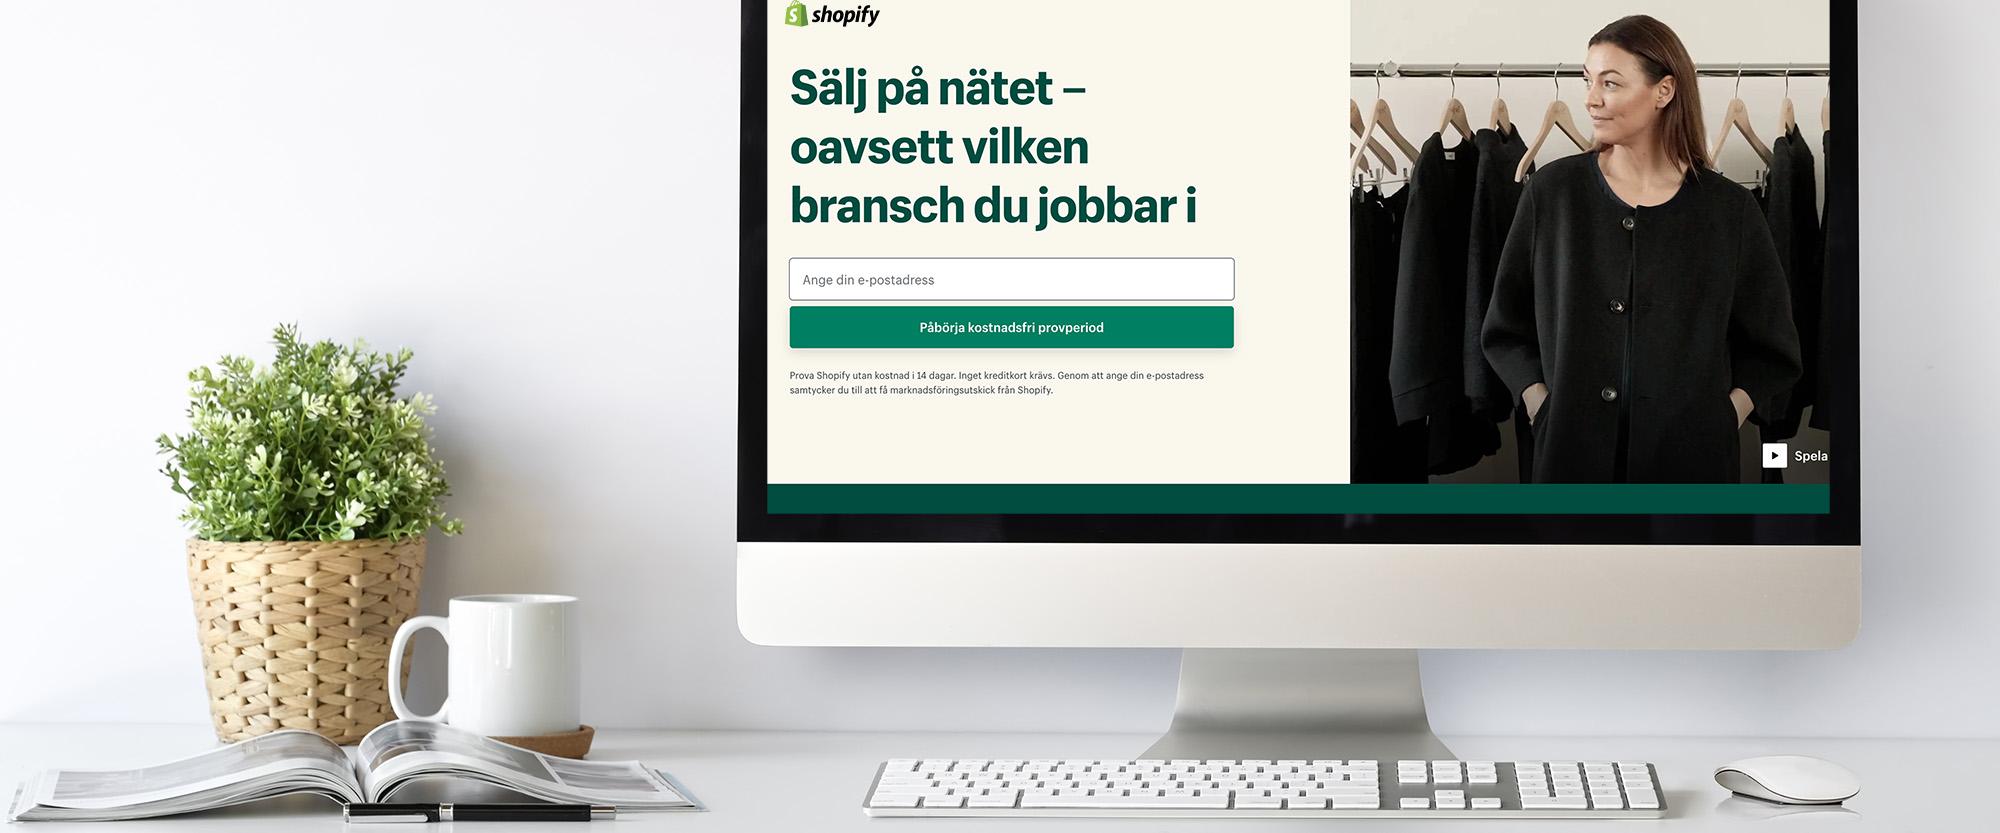 Onlinekurs Webbutik med Shopify